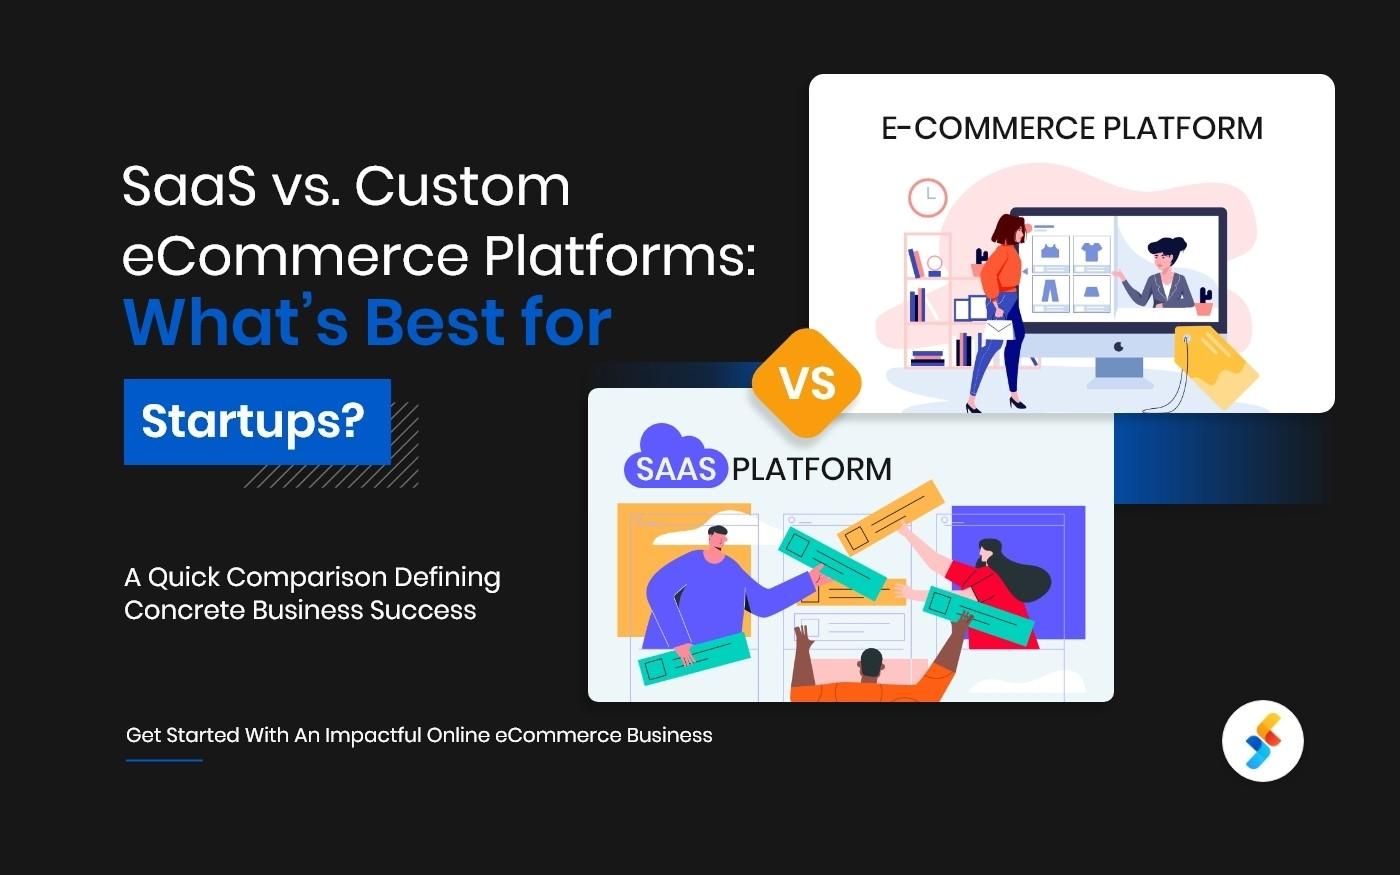 SaaS vs. Custom eCommerce Platforms: What's Best for Startups?